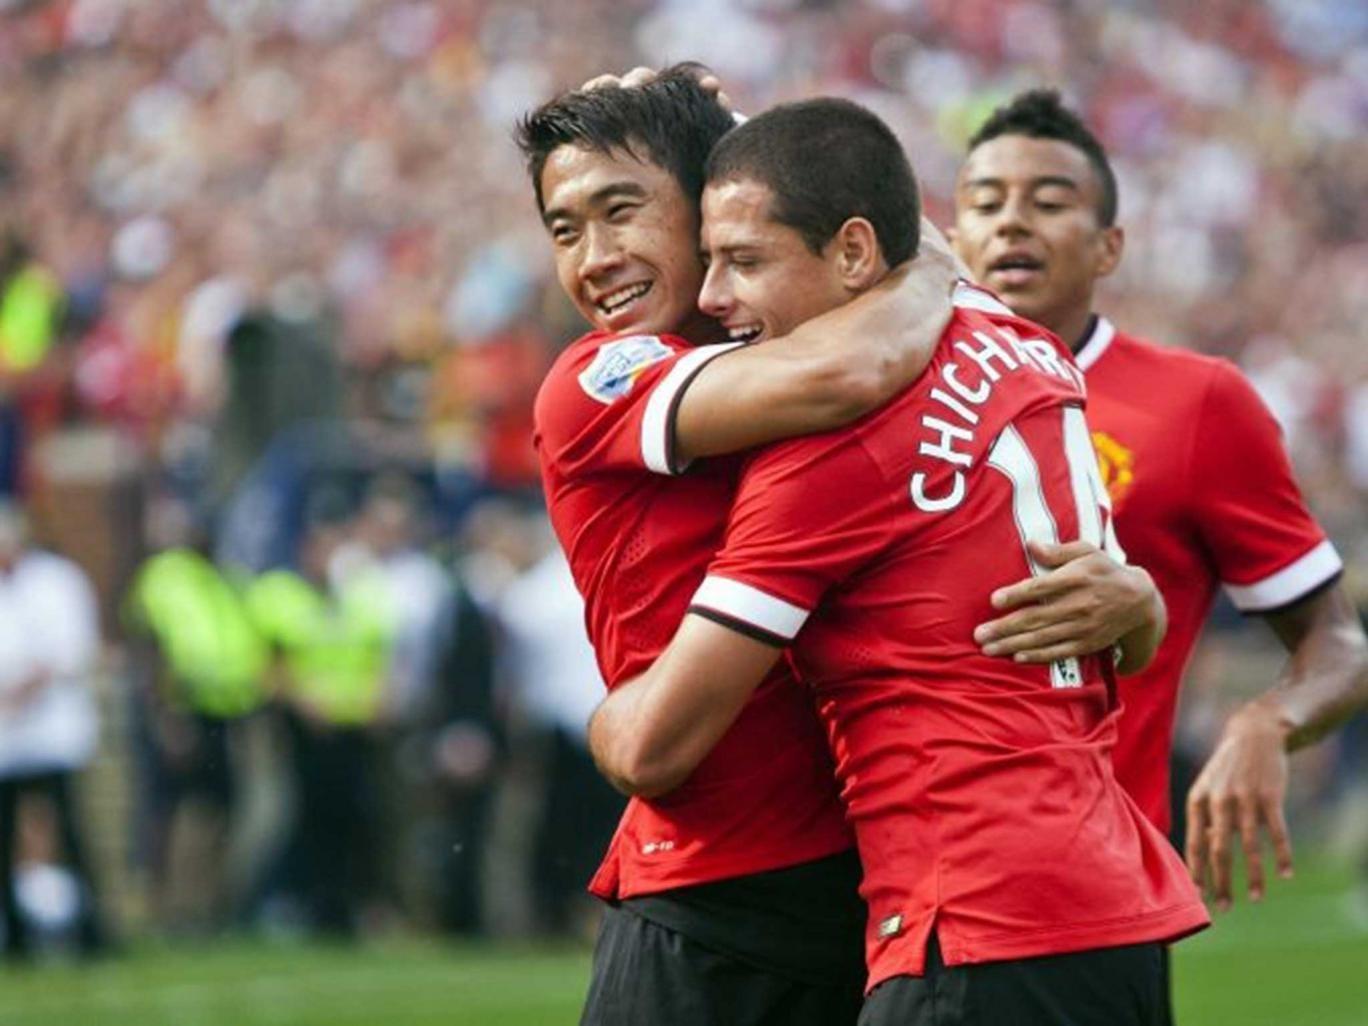 Shinji Kagawa, left, celebrates his assist for a goal from forward Javier Hernandez